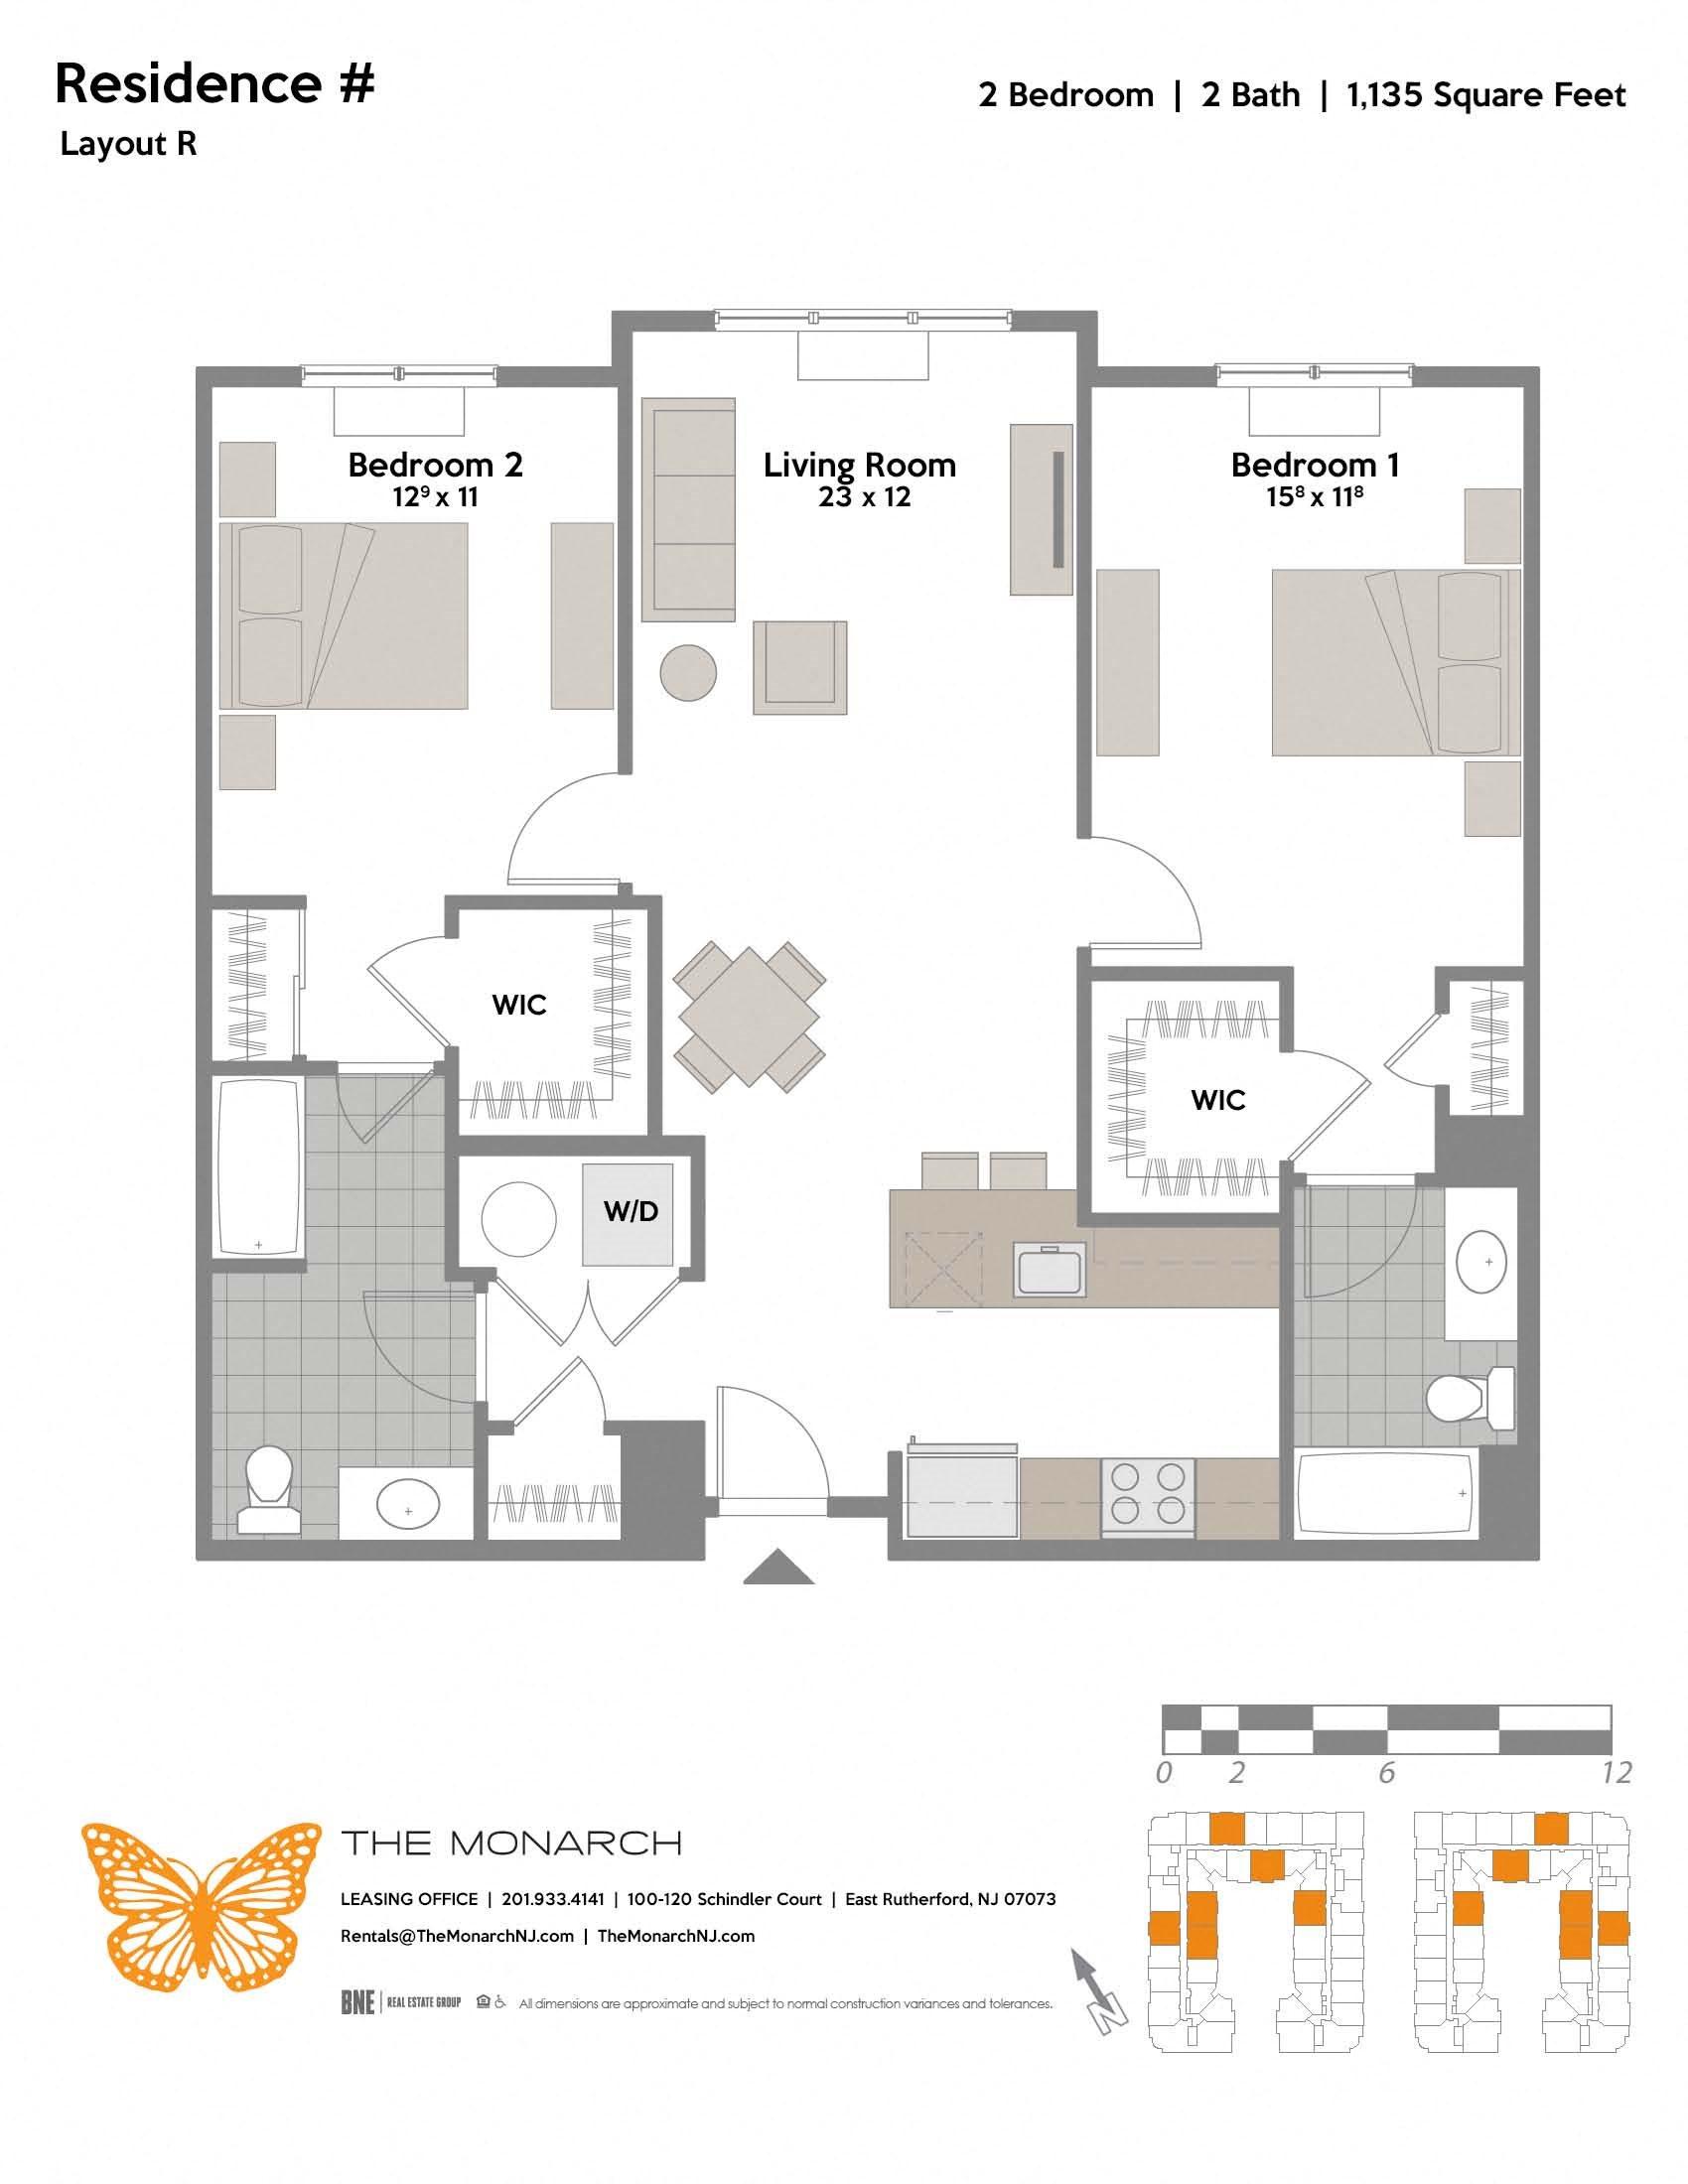 Layout R Floor Plan 7